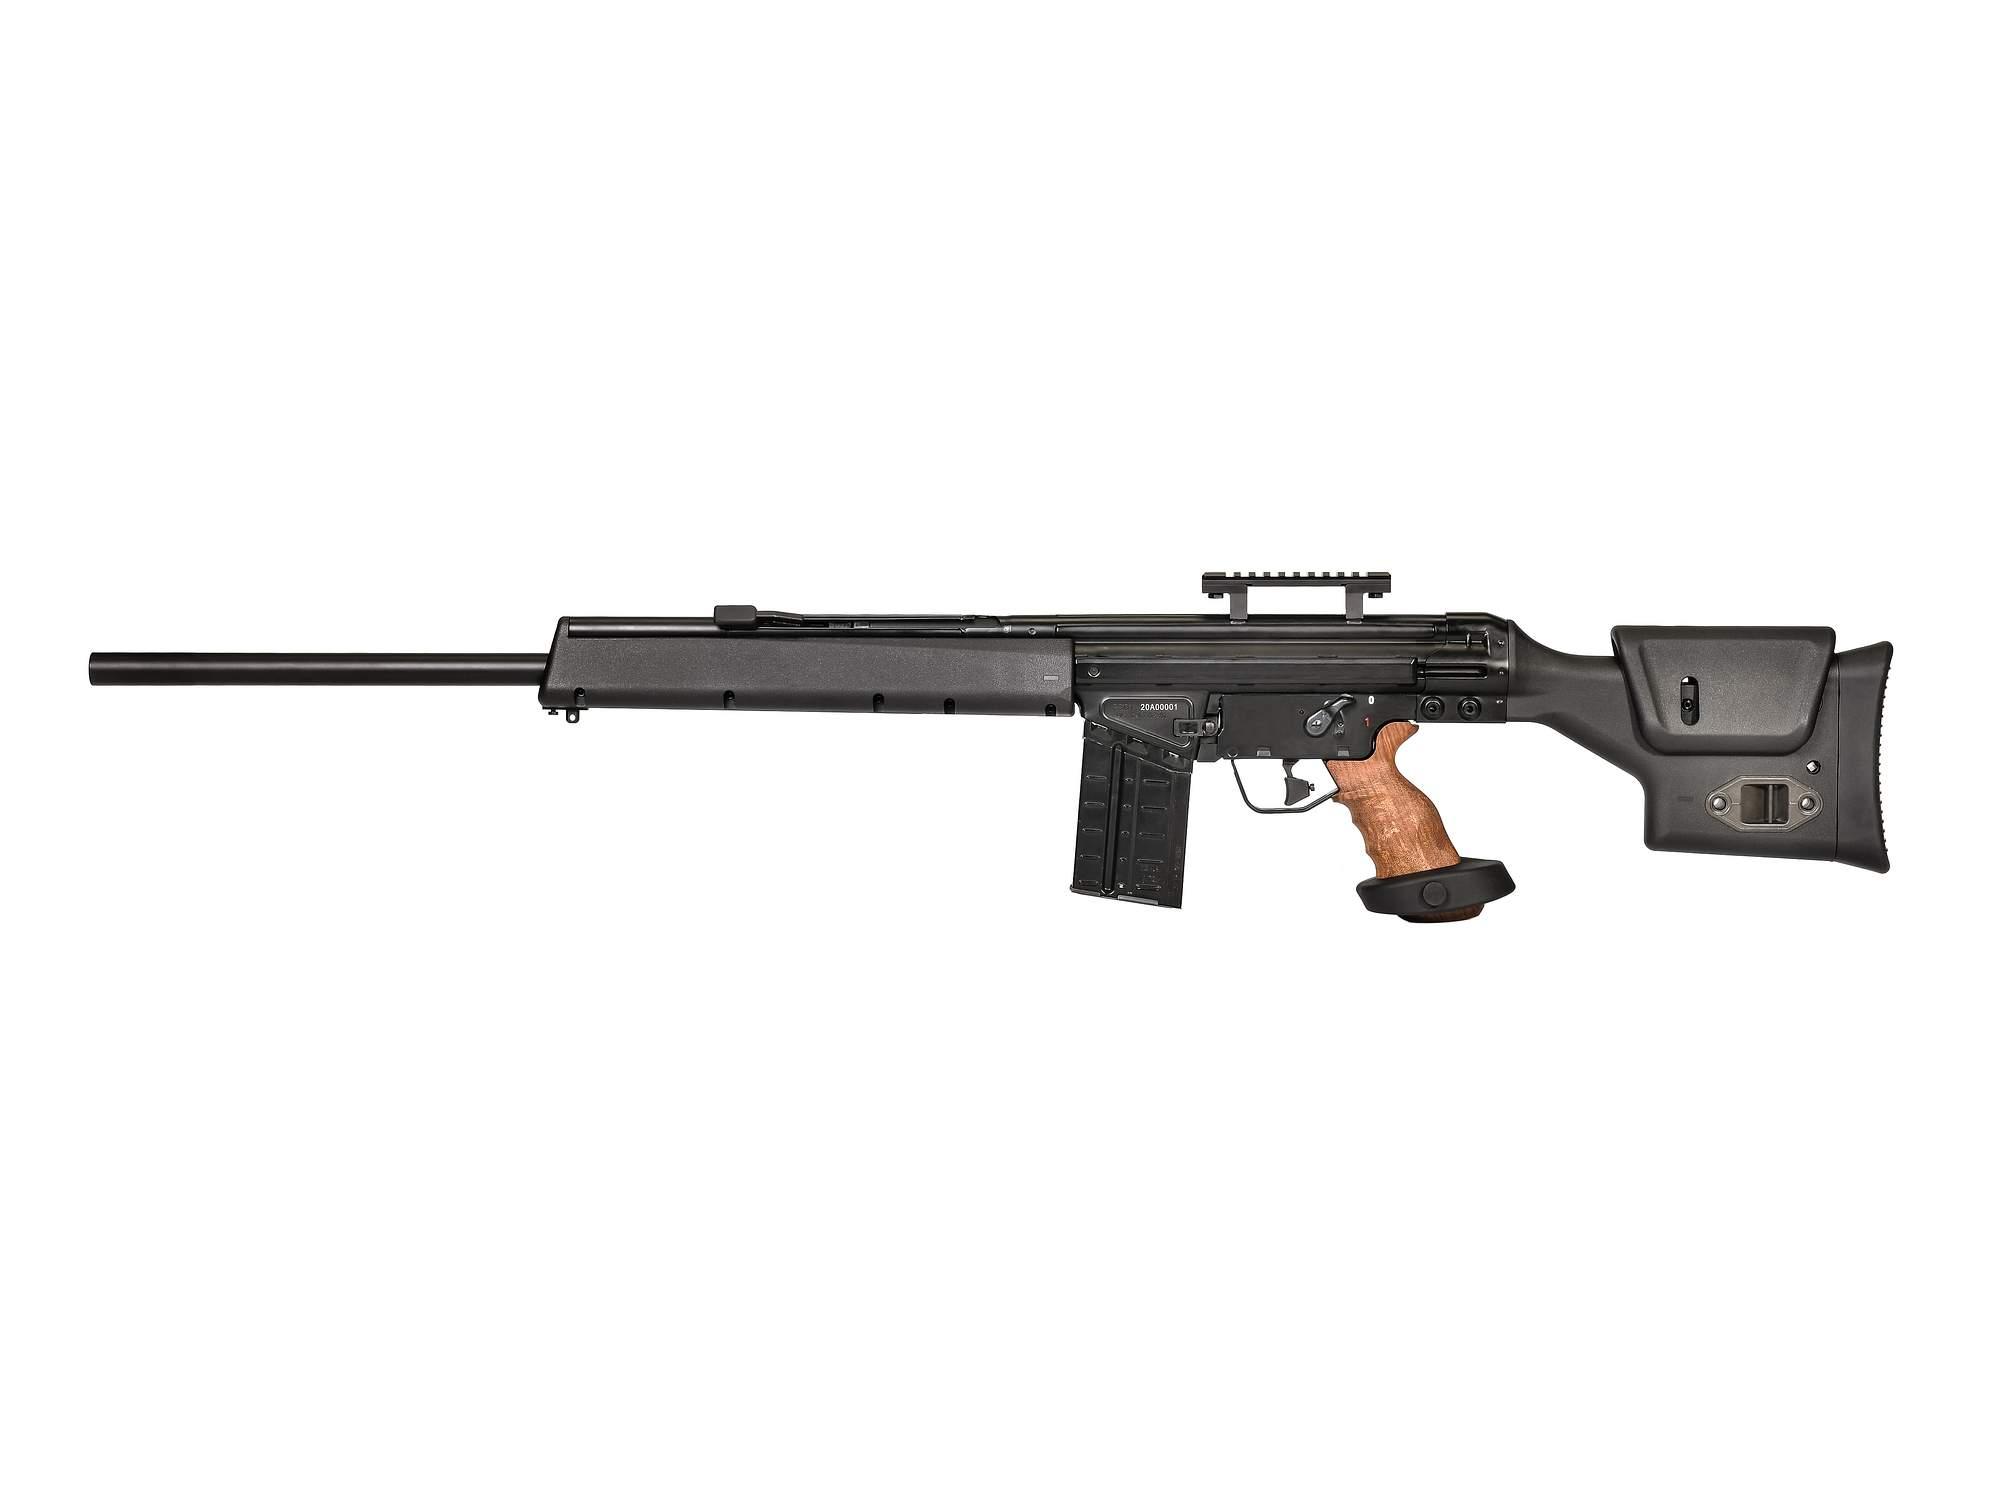 VF2J-LPSG1-BK01